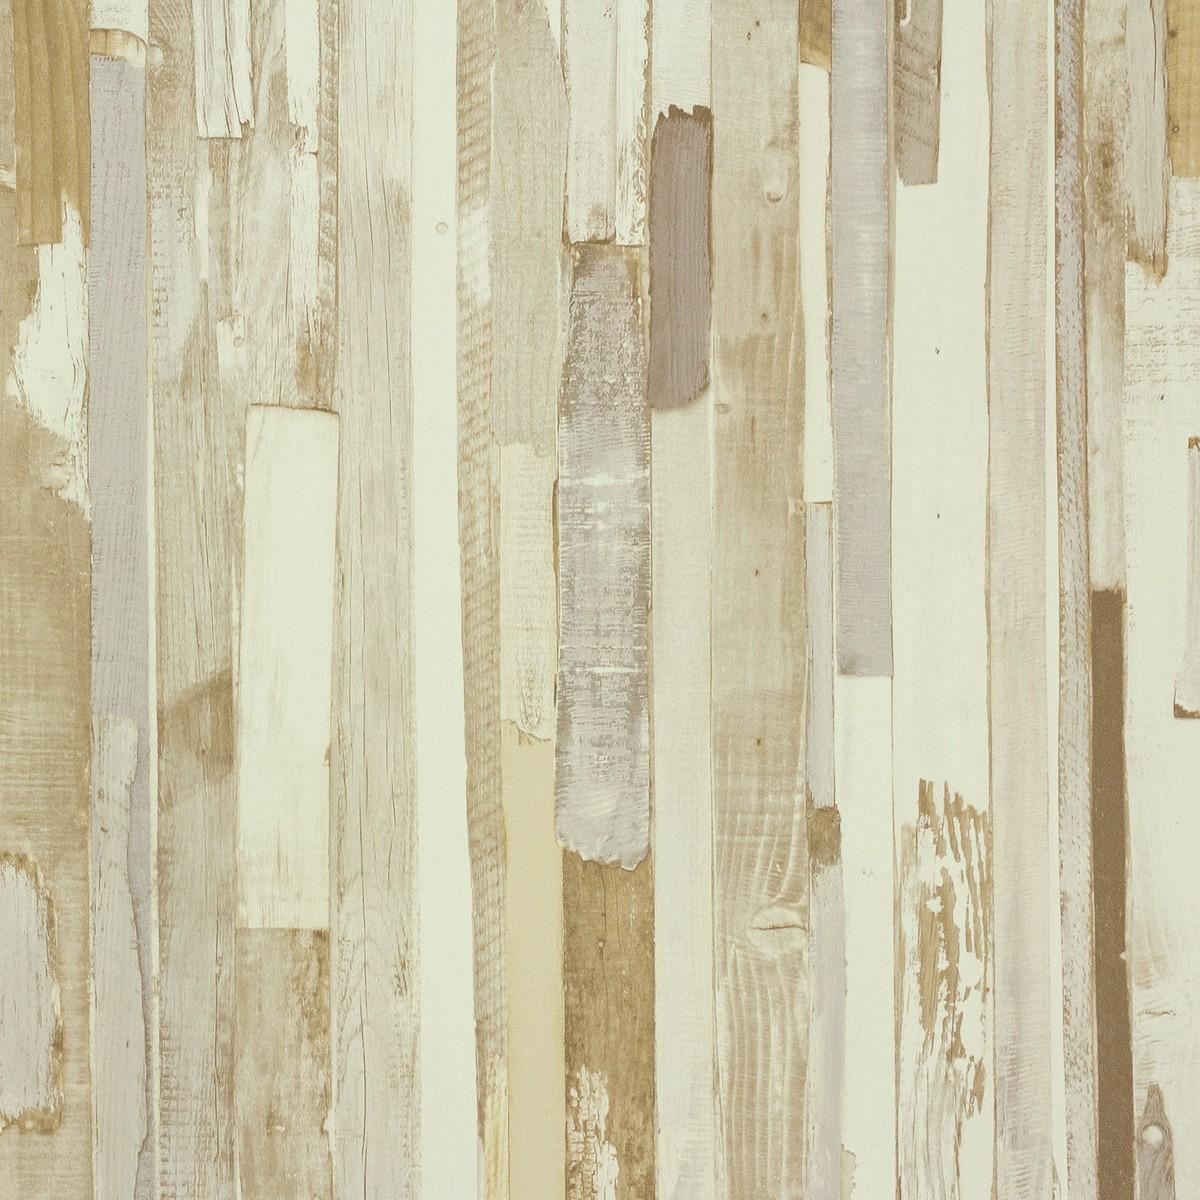 tapete holzoptik creme wei tapeten rasch textil new age 319940. Black Bedroom Furniture Sets. Home Design Ideas